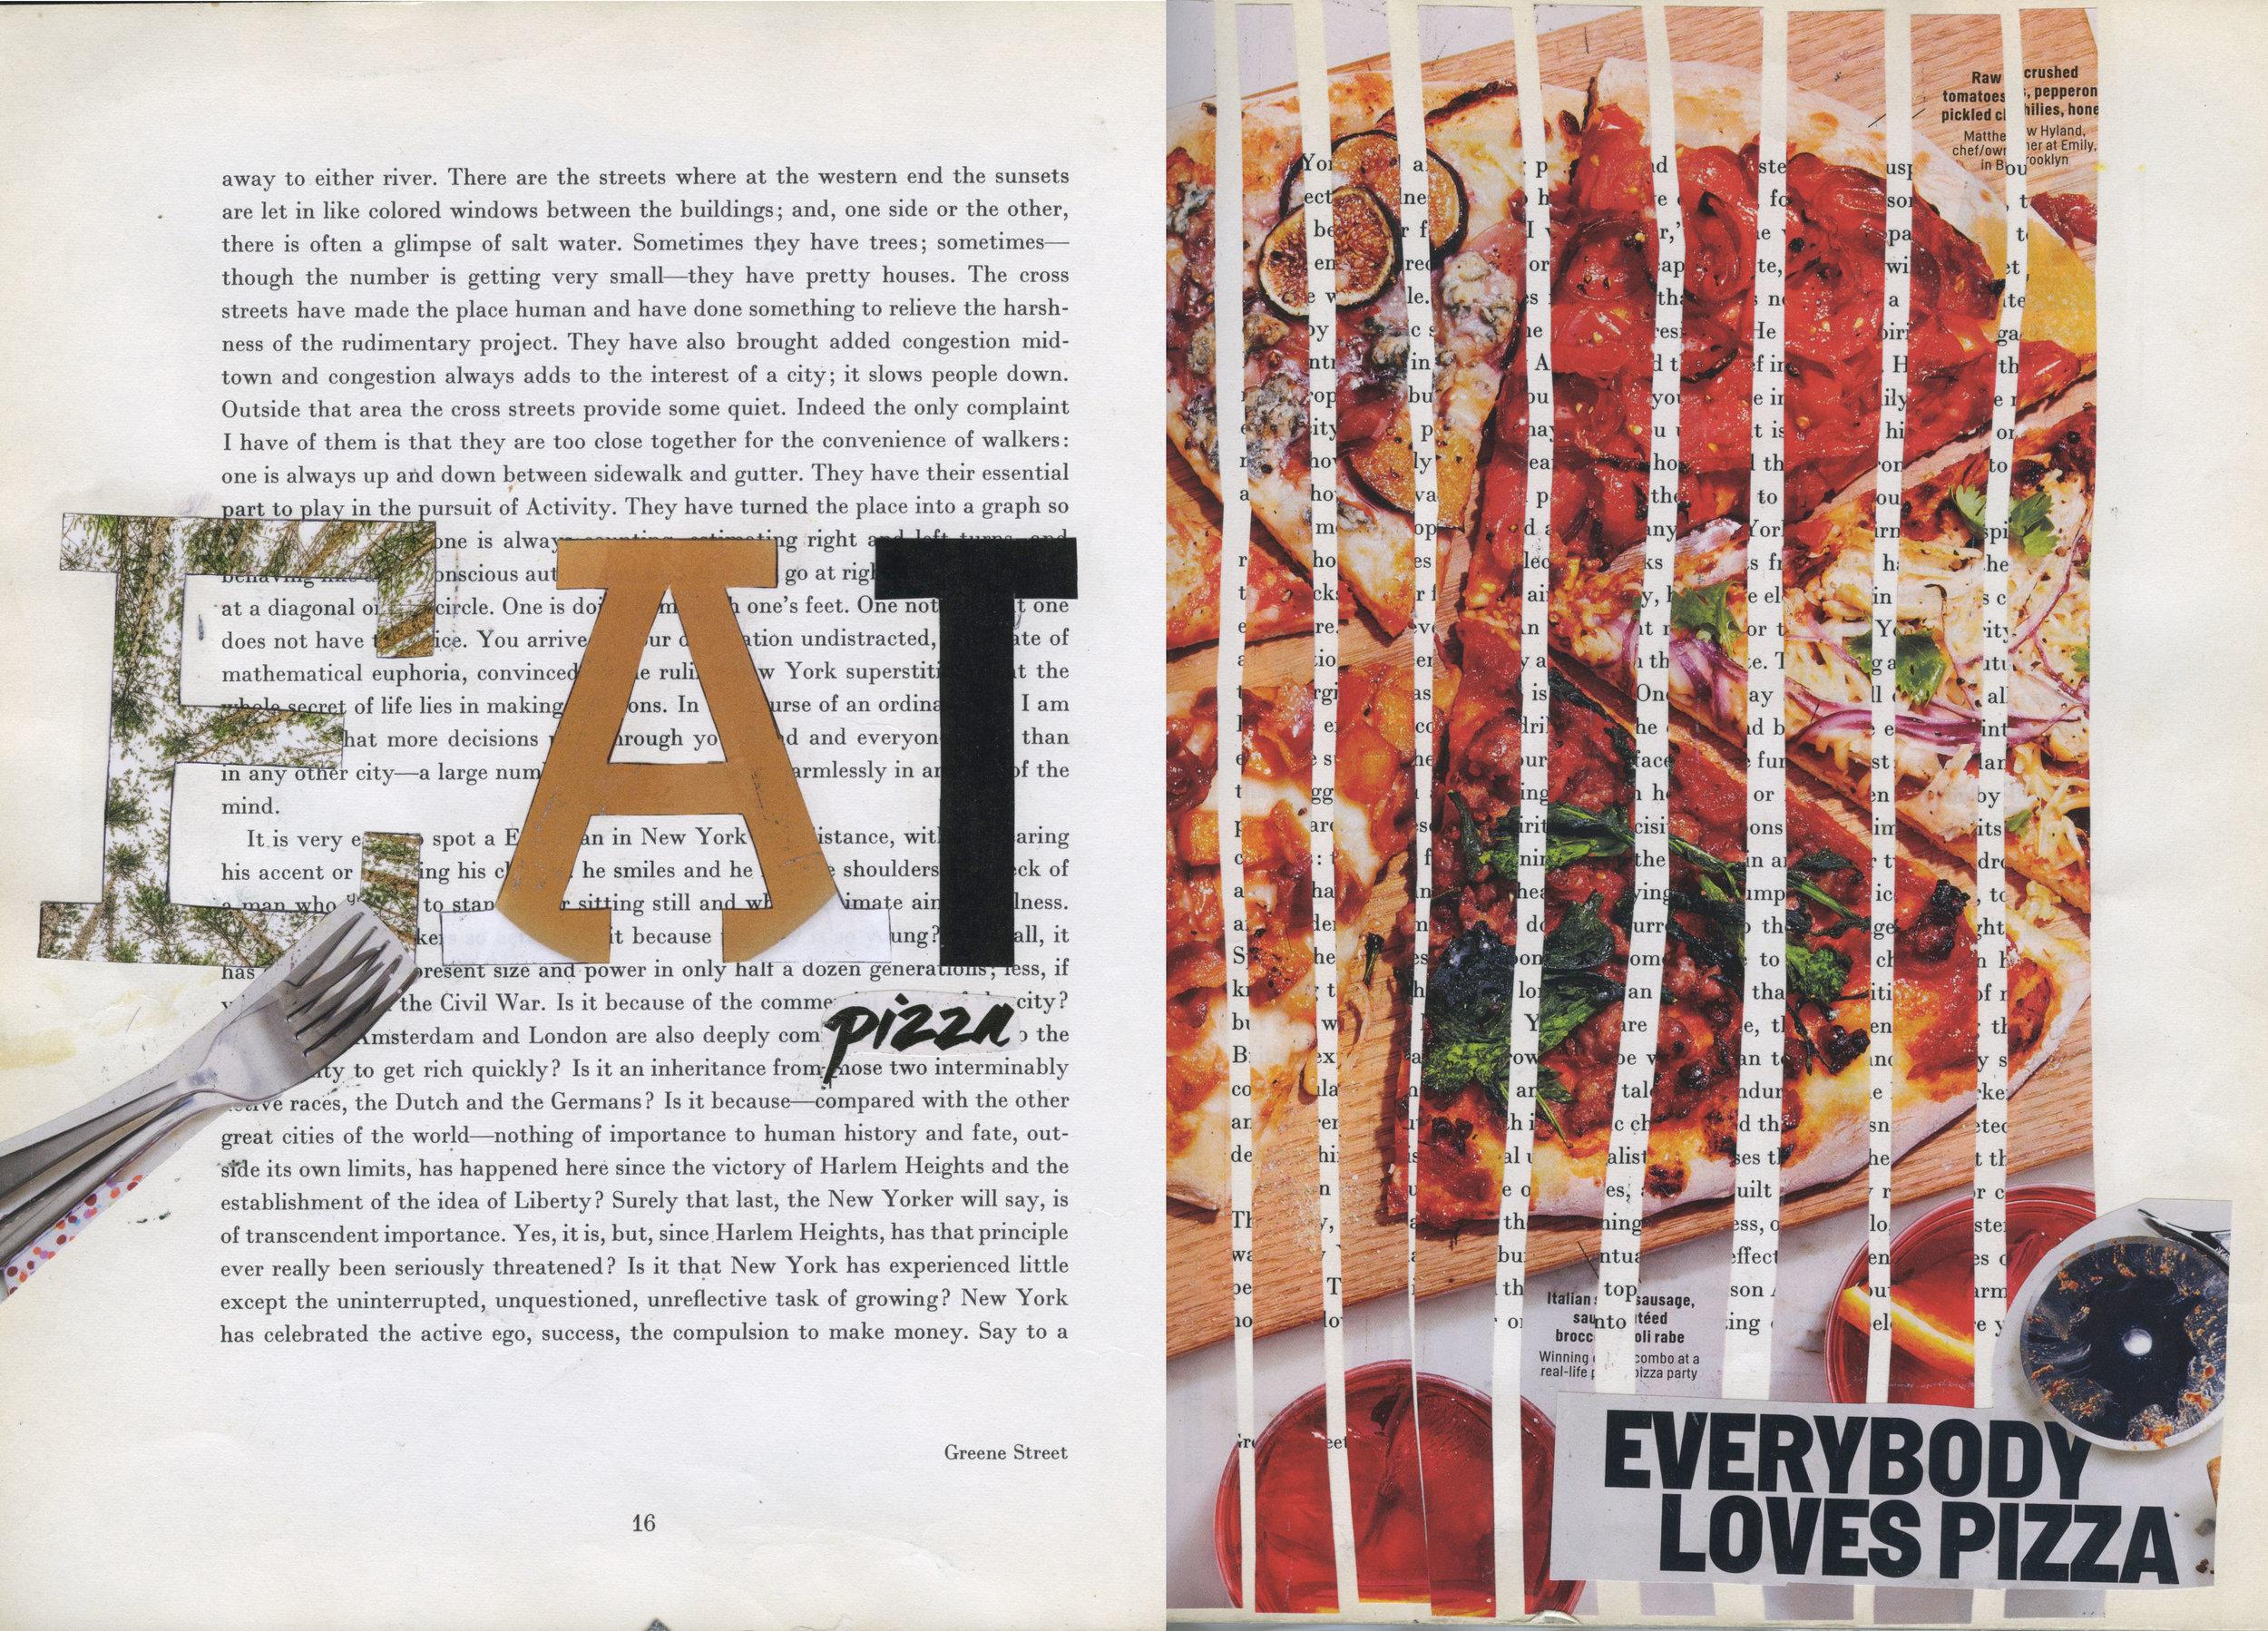 eat pizza - Kaylee Dall.jpg